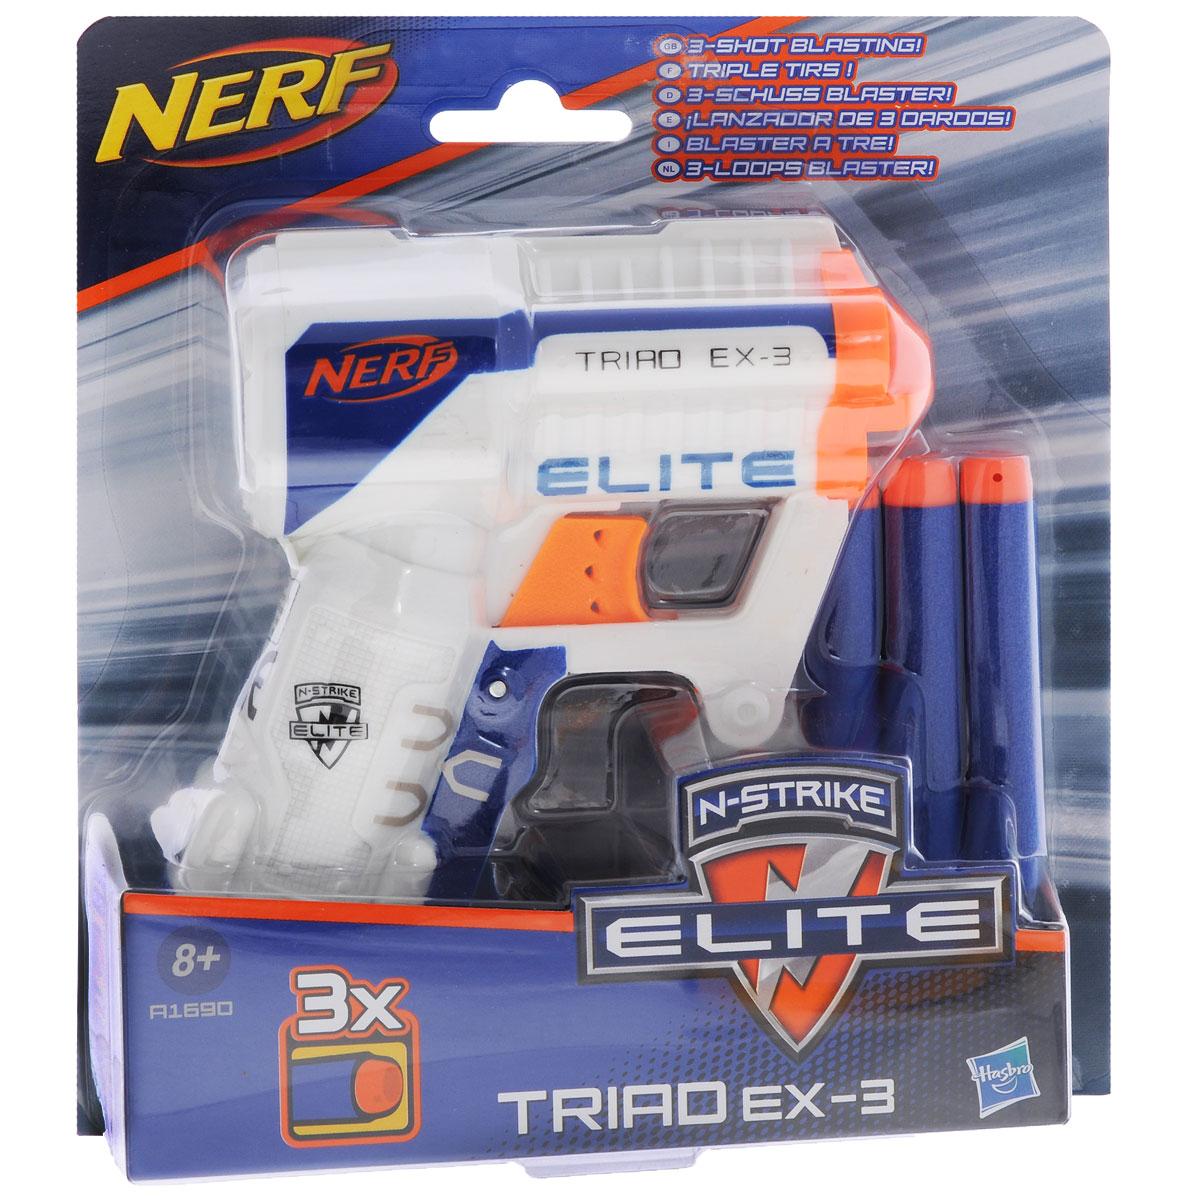 Nerf Бластер N-Strike Elite: Triad EX-3, с патронами, цвет: белый, синий, оранжевый nerf бластер elite disruptor